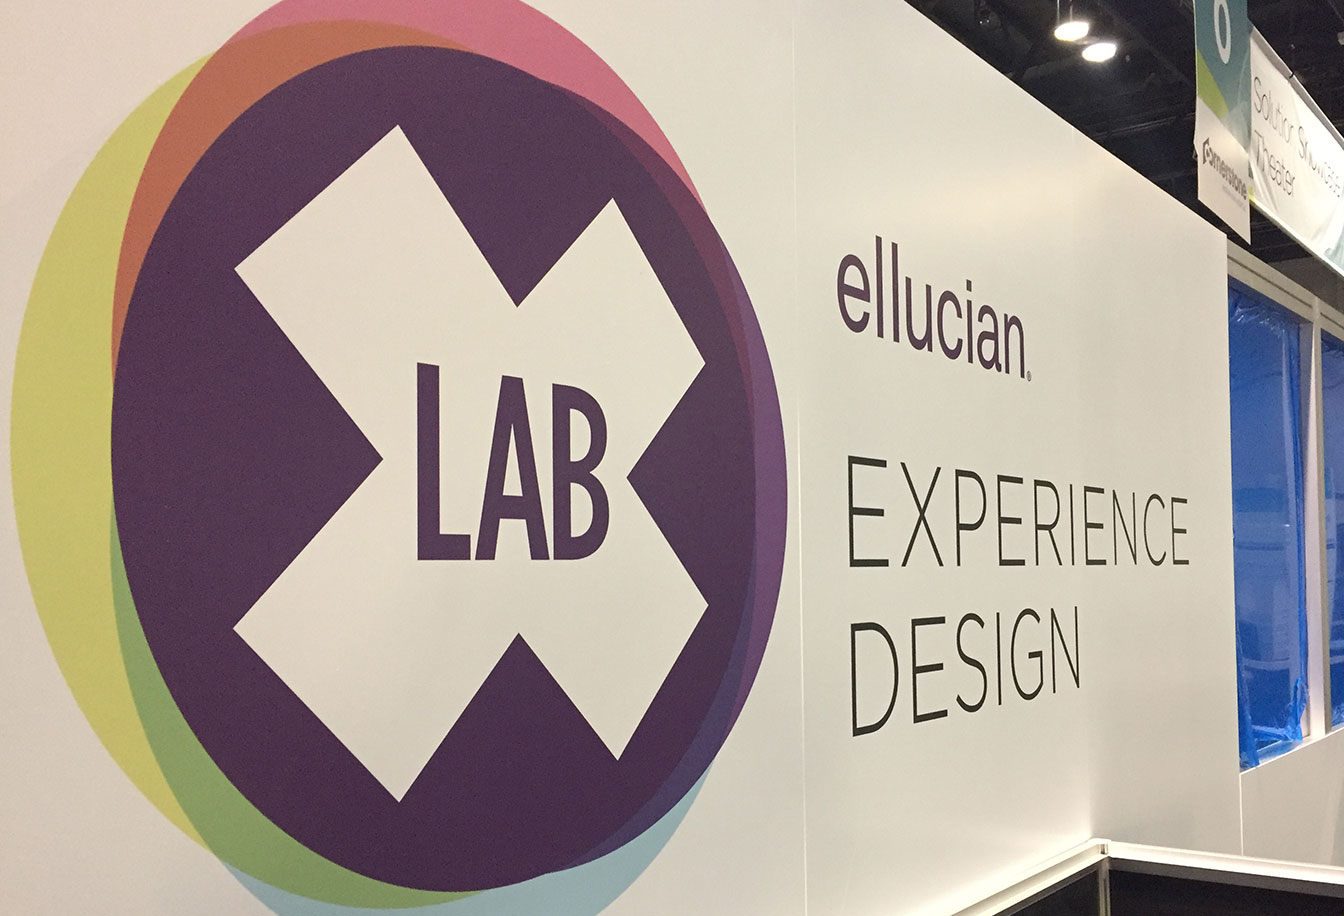 X Lab design thinking booth